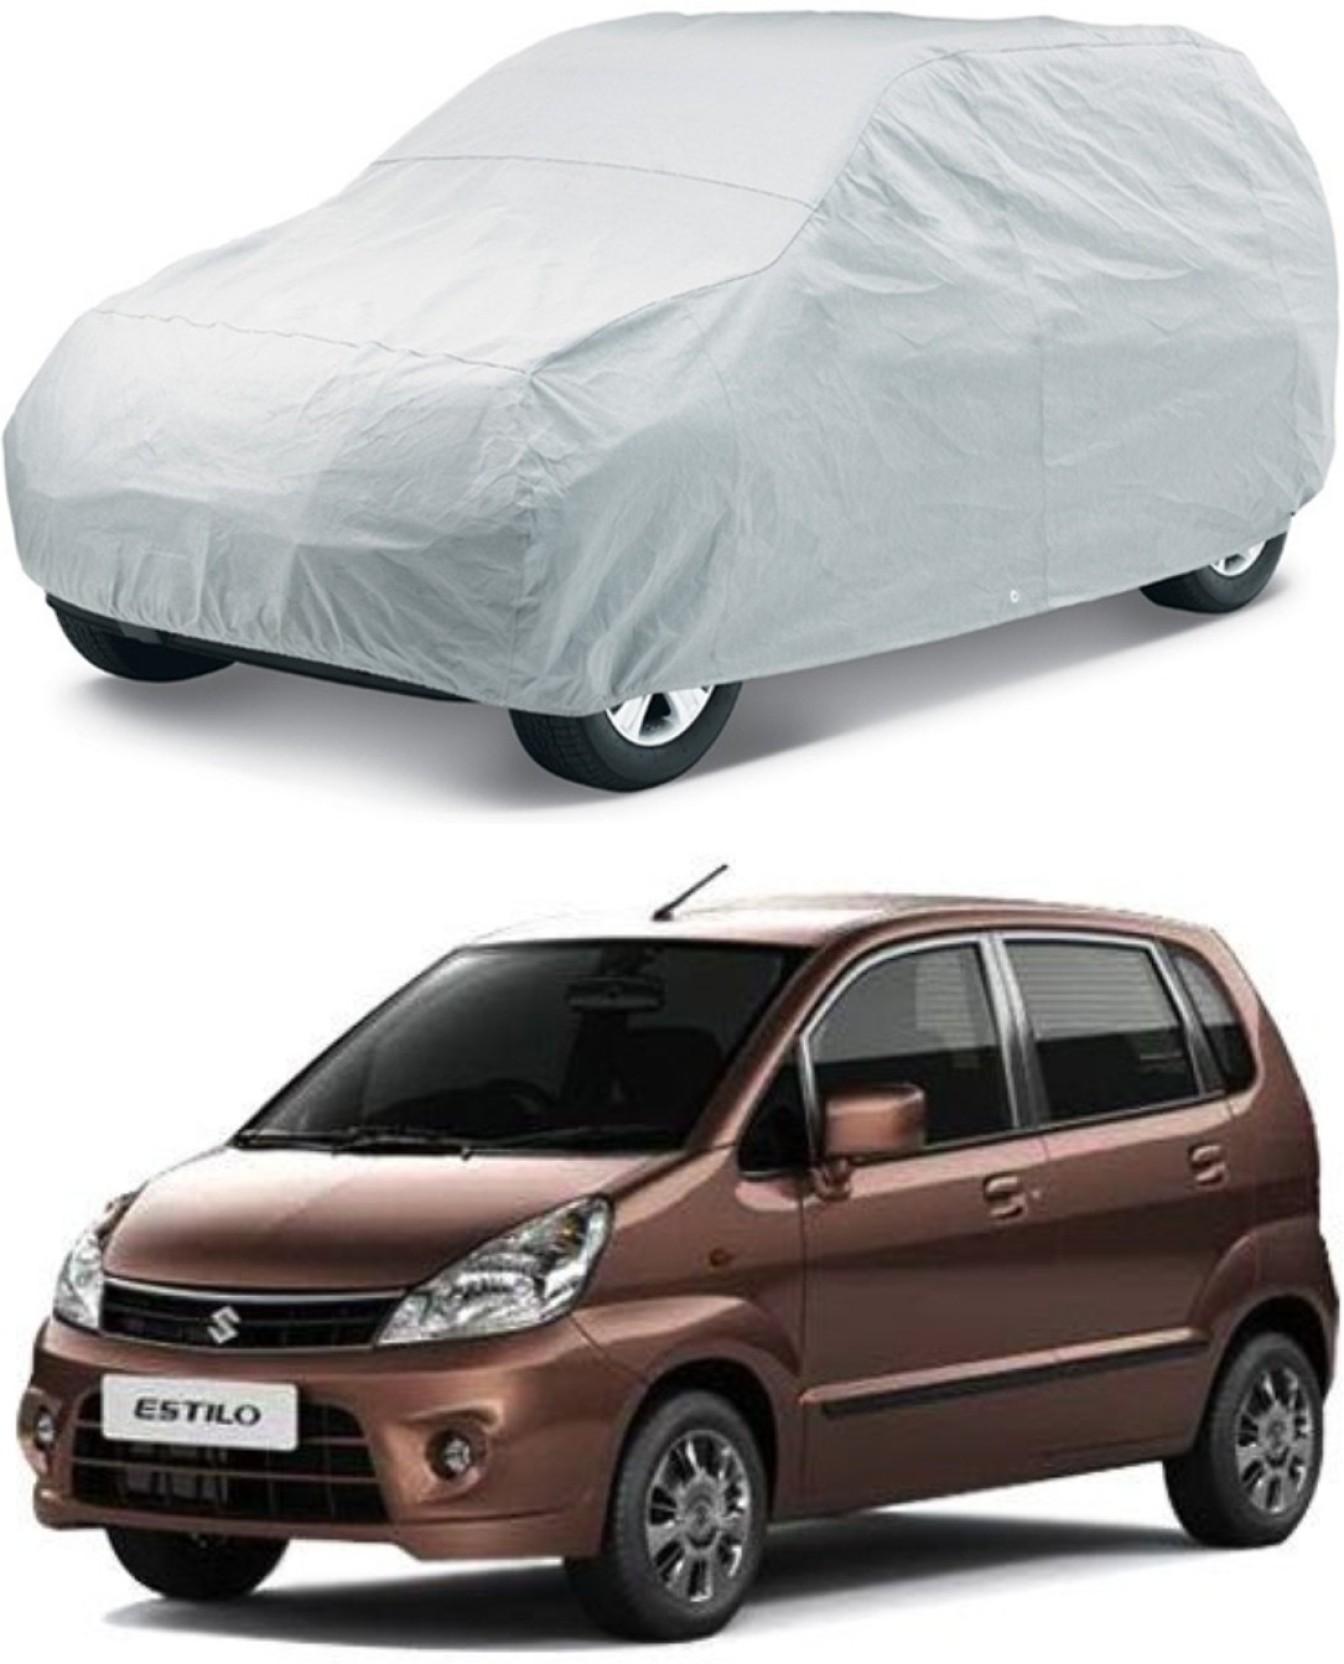 Hms car cover for maruti suzuki zen estilo without mirror pockets silver for 2015 2016 2017 2018 models